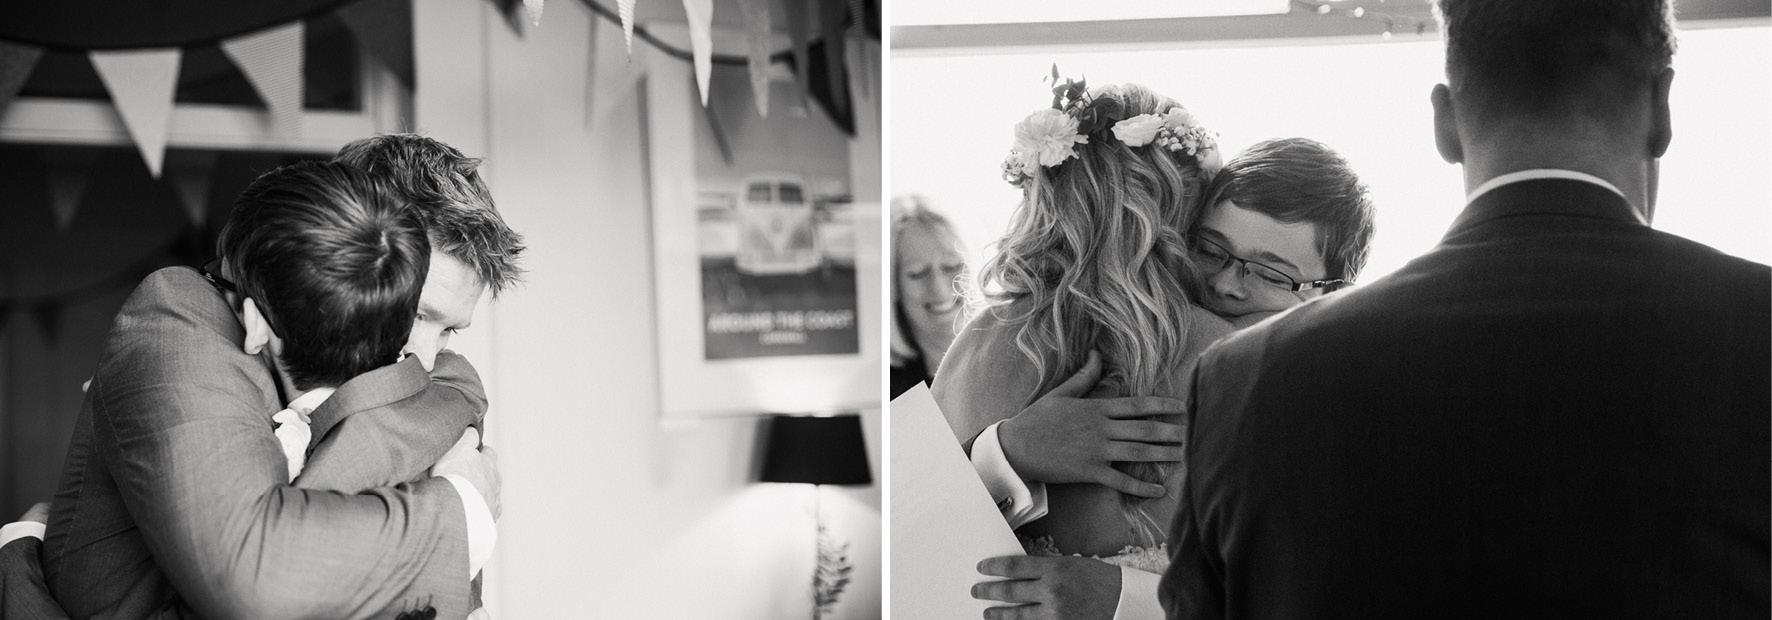 Devon_Wedding_Photographer_Ceremony.jpg